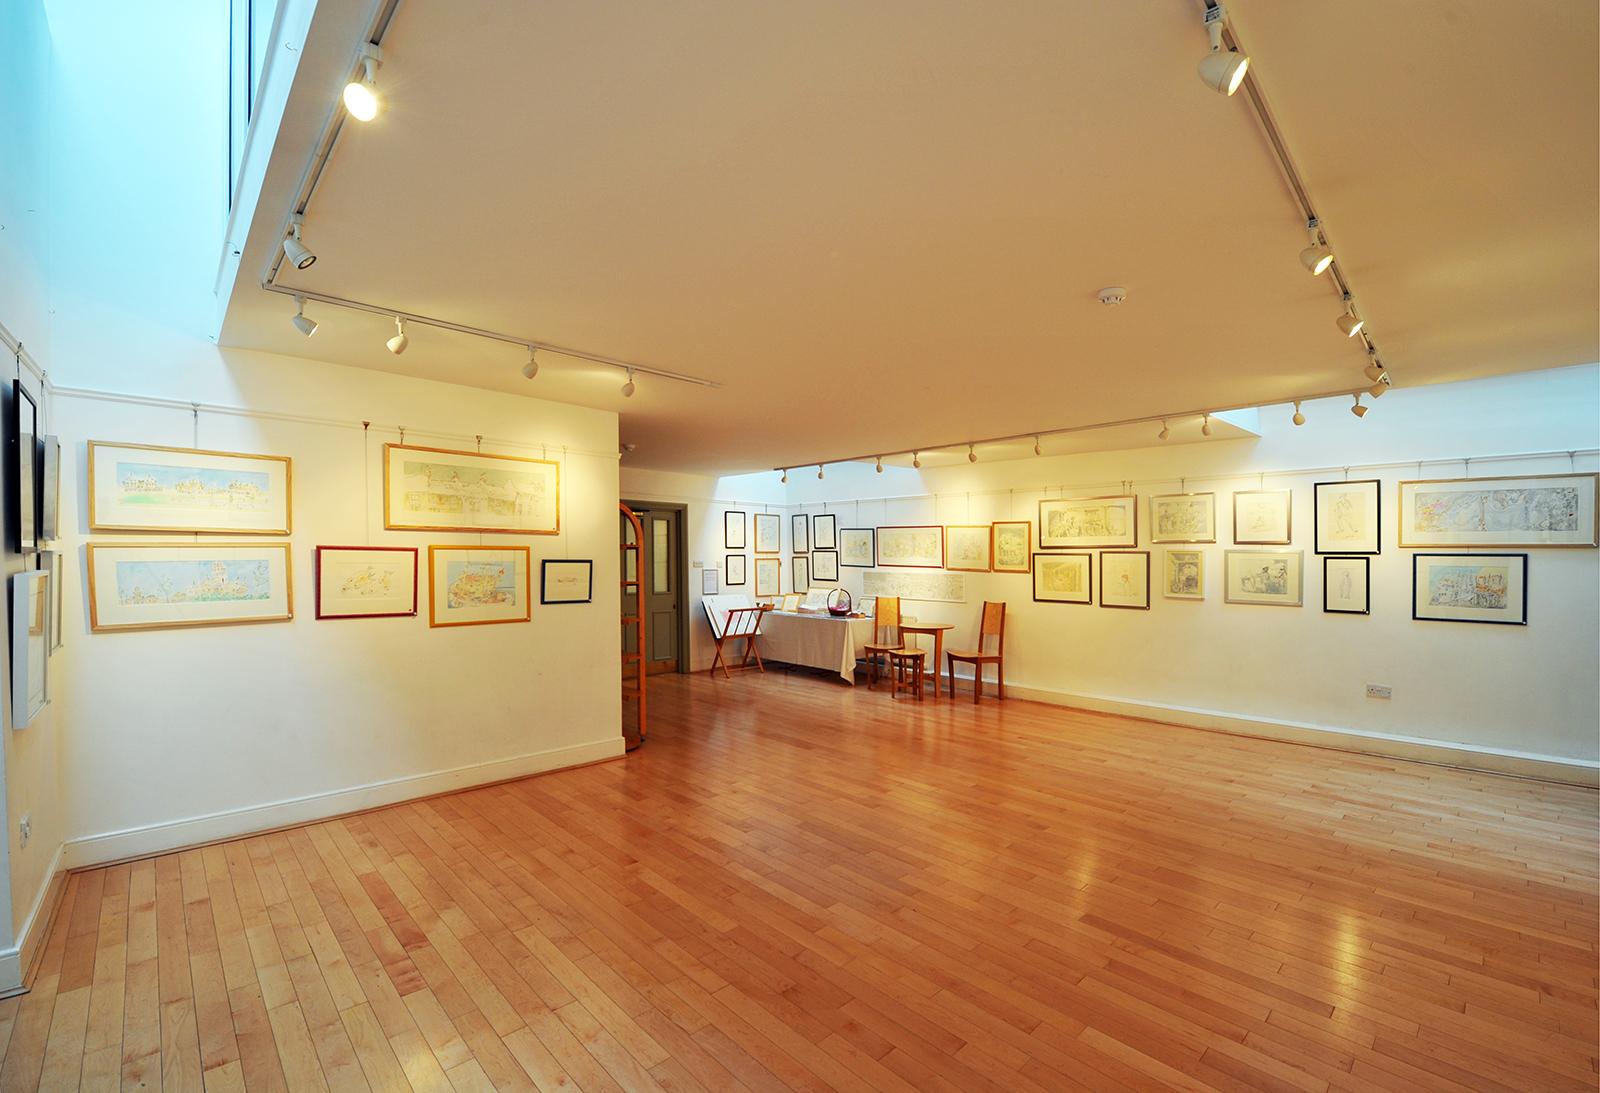 The Owen Mumford Gallery